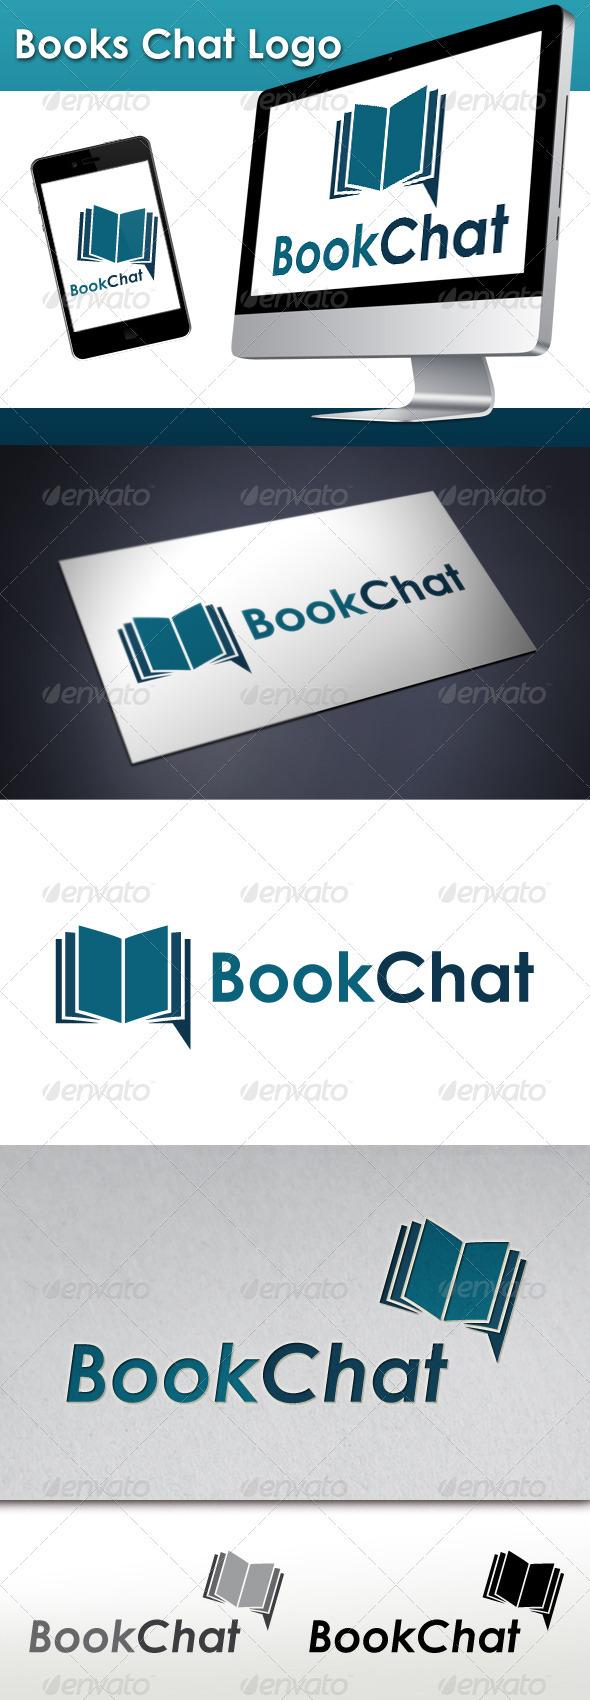 Books Chat Logo